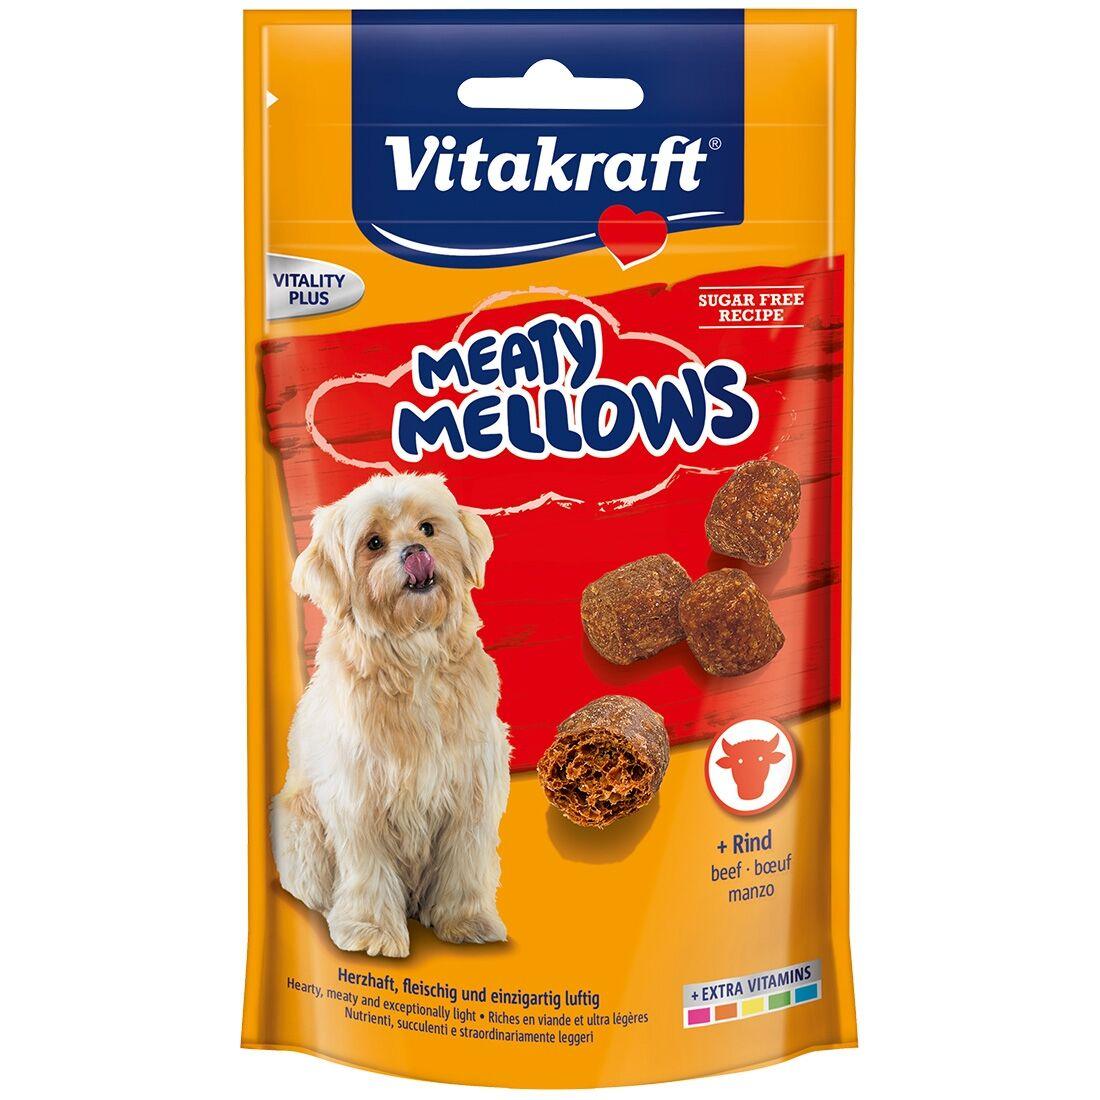 Vitakraft Friandise pour chien Vitakraft Meaty Mellows au Bœuf Contenance : 120 g